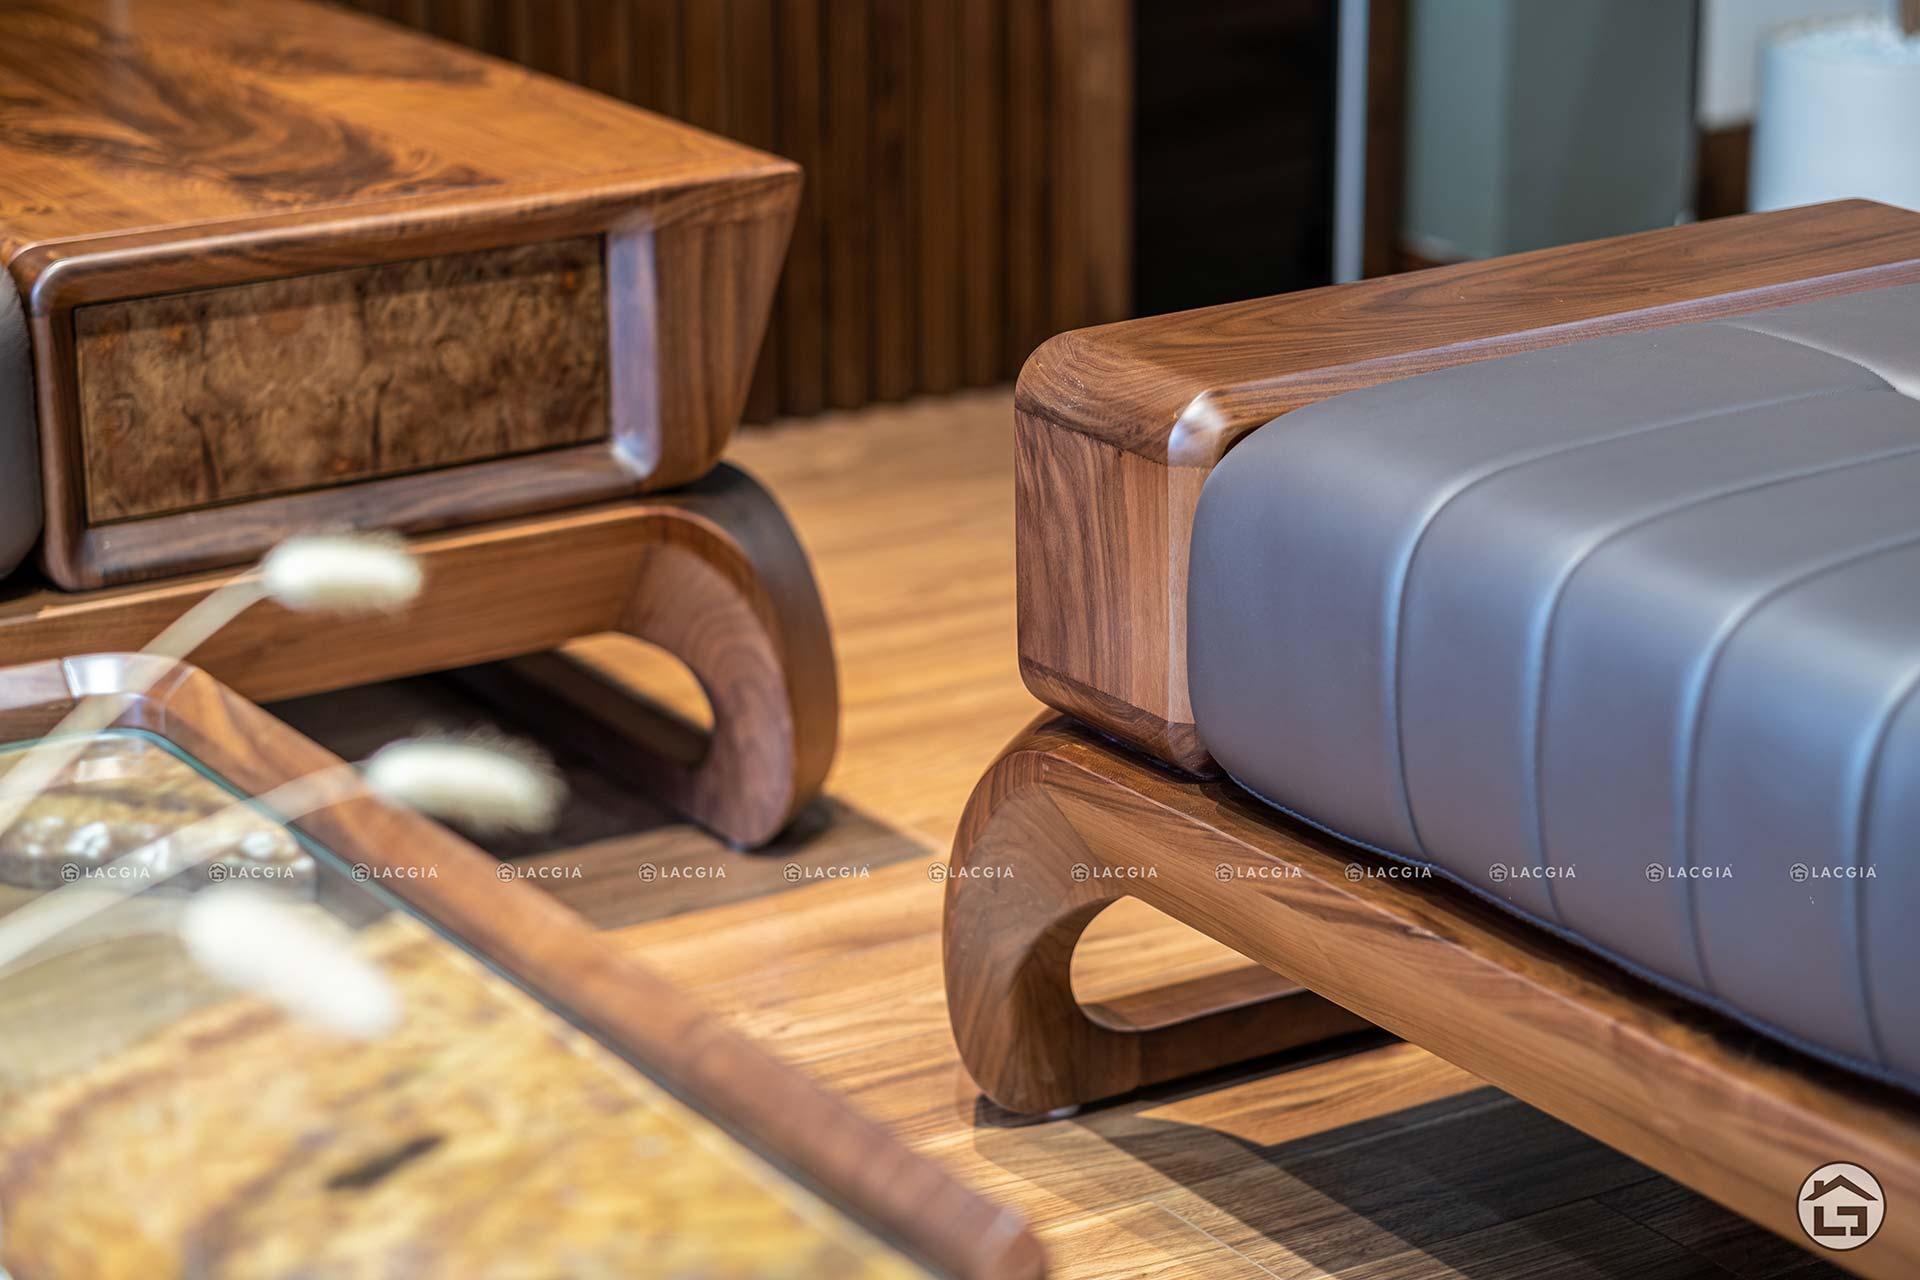 Sofa gỗ LV - Sofa gỗ óc chó cao cấp